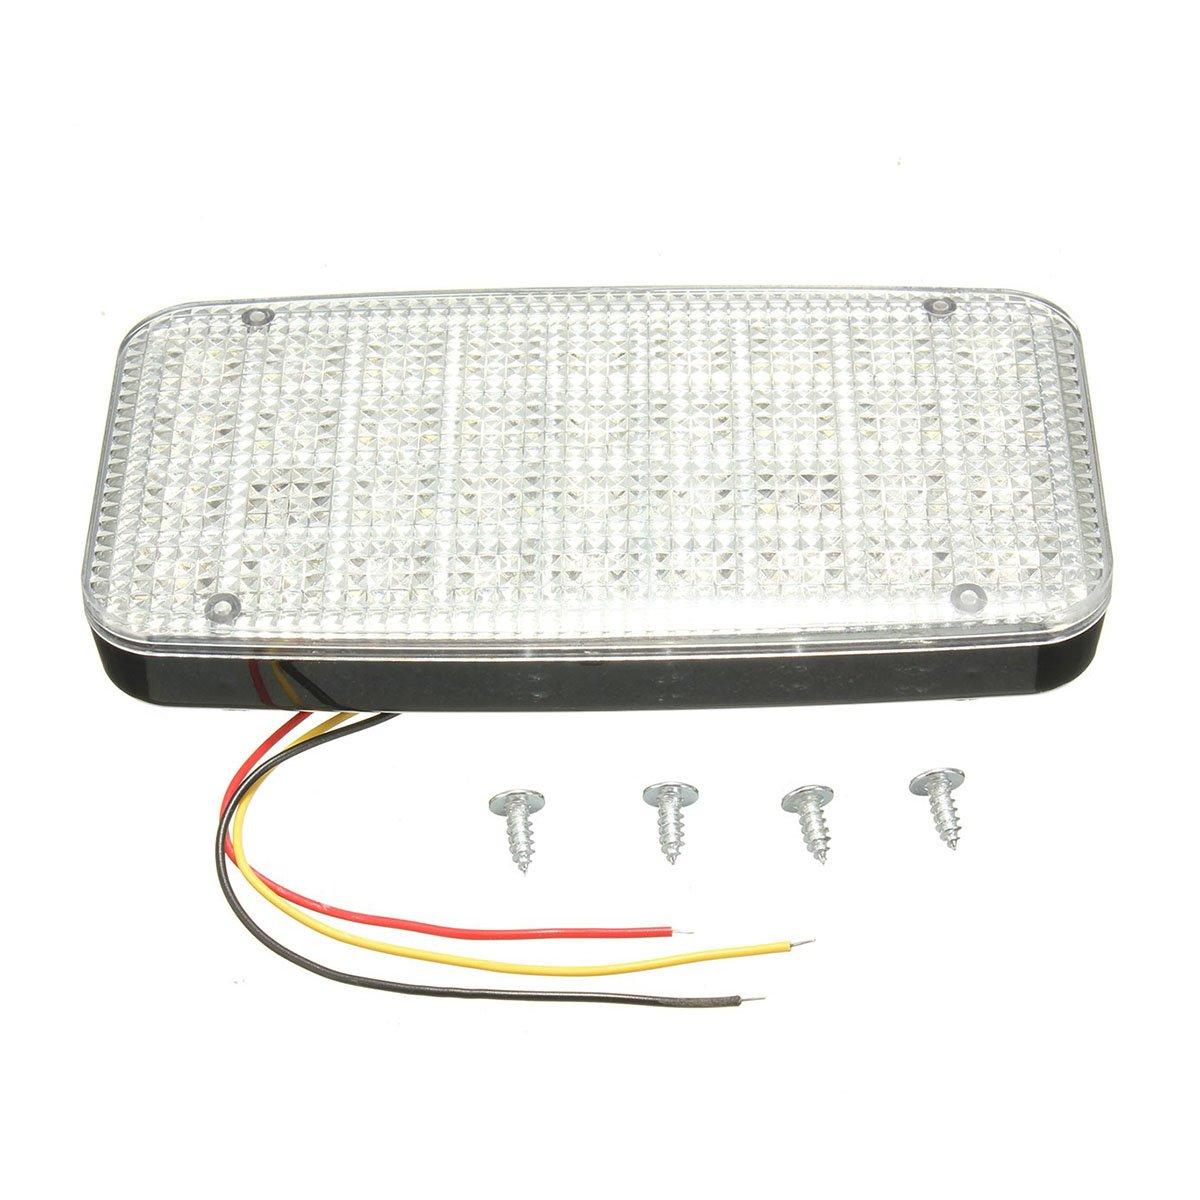 WINOMO LED Car Roof Light 12V 36LED Auto Car Interior Reading Light Plafoniera a soffitto